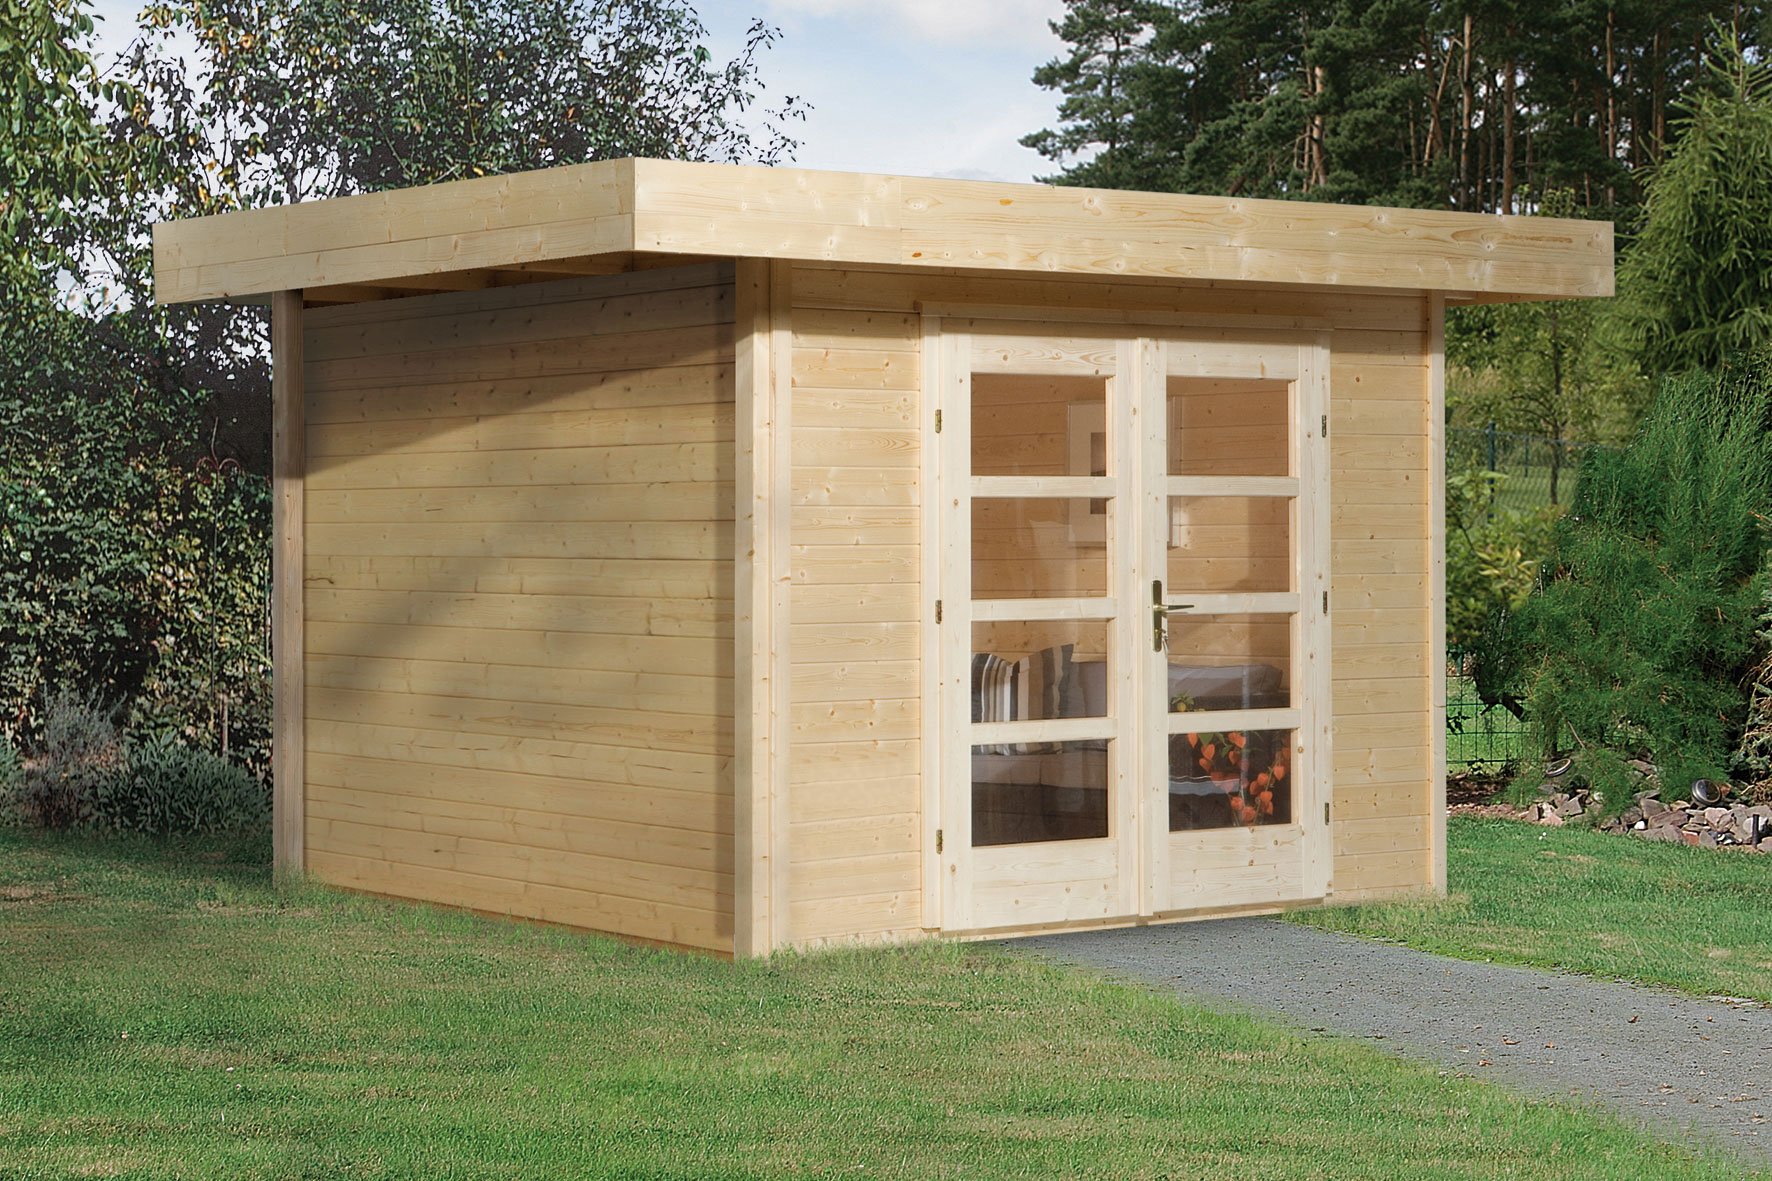 weka gartenhaus 28 mm designhaus 126 gr 2 natur 356x325cm vd 50cm bei. Black Bedroom Furniture Sets. Home Design Ideas